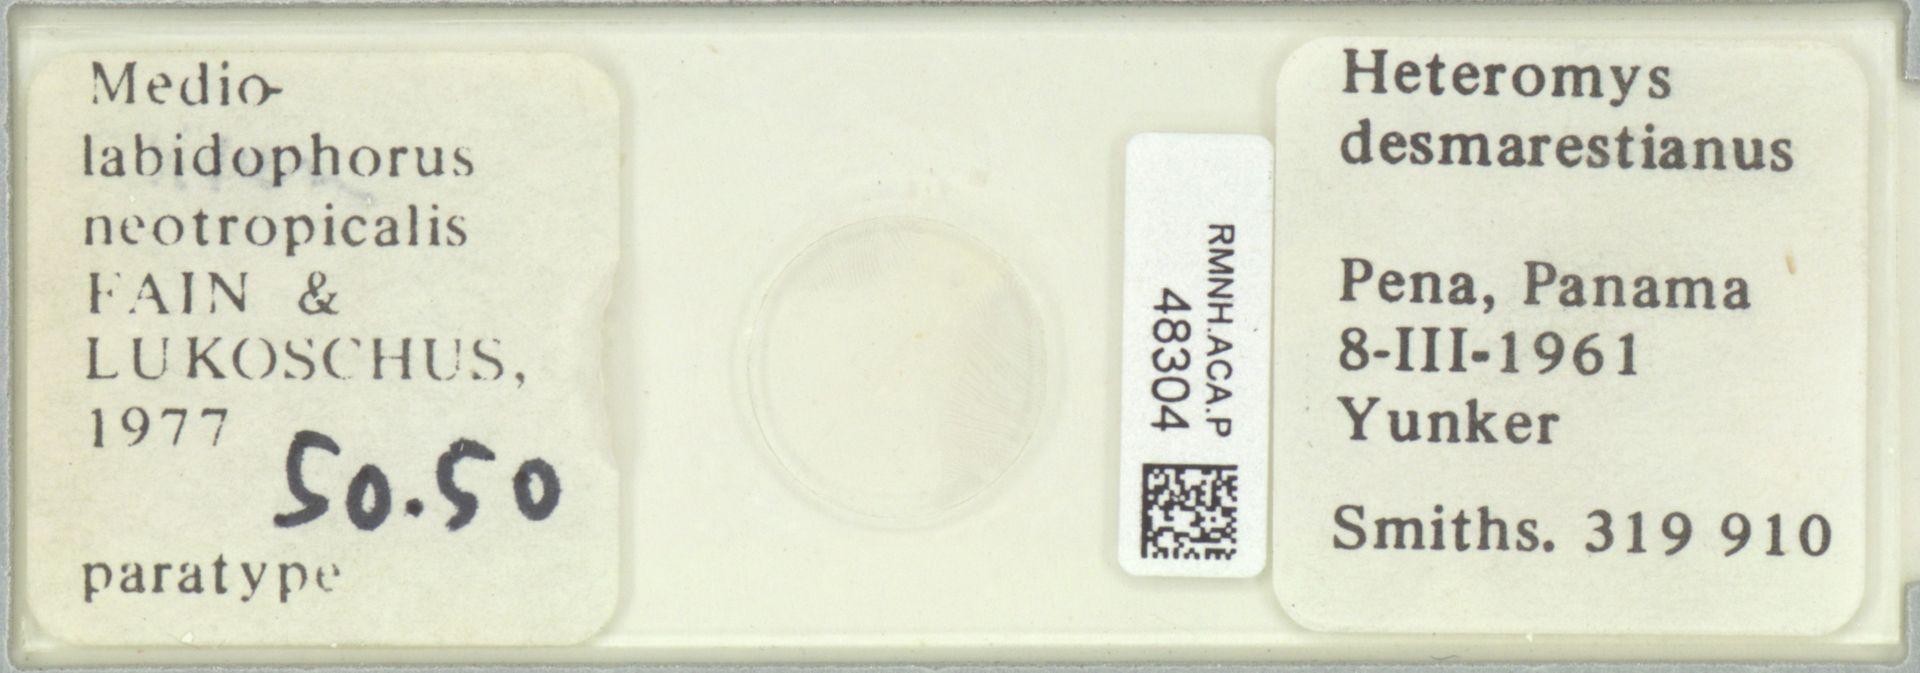 RMNH.ACA.P.48304 | Mediolabidophorus neotropicalis Fain & Lukoschus 1977